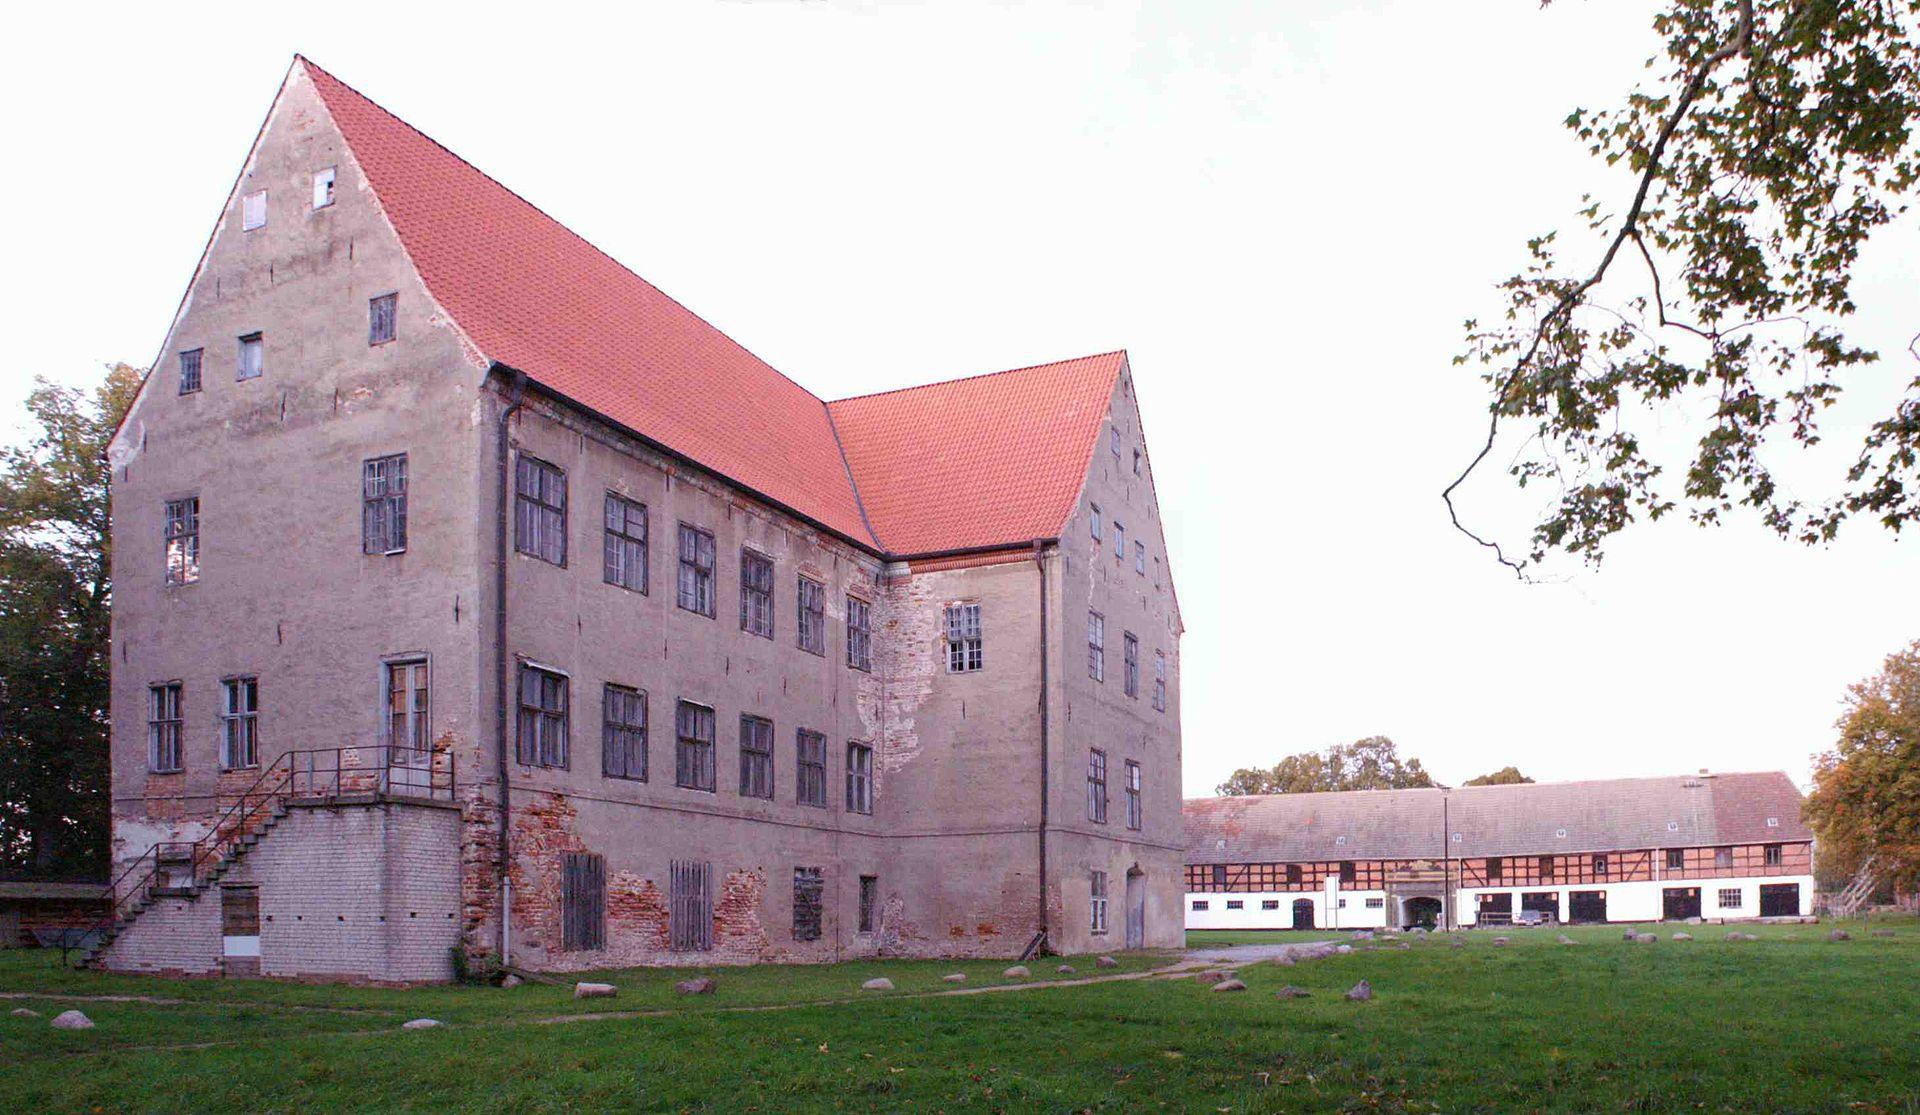 Bild Schloss Ludwigsburg